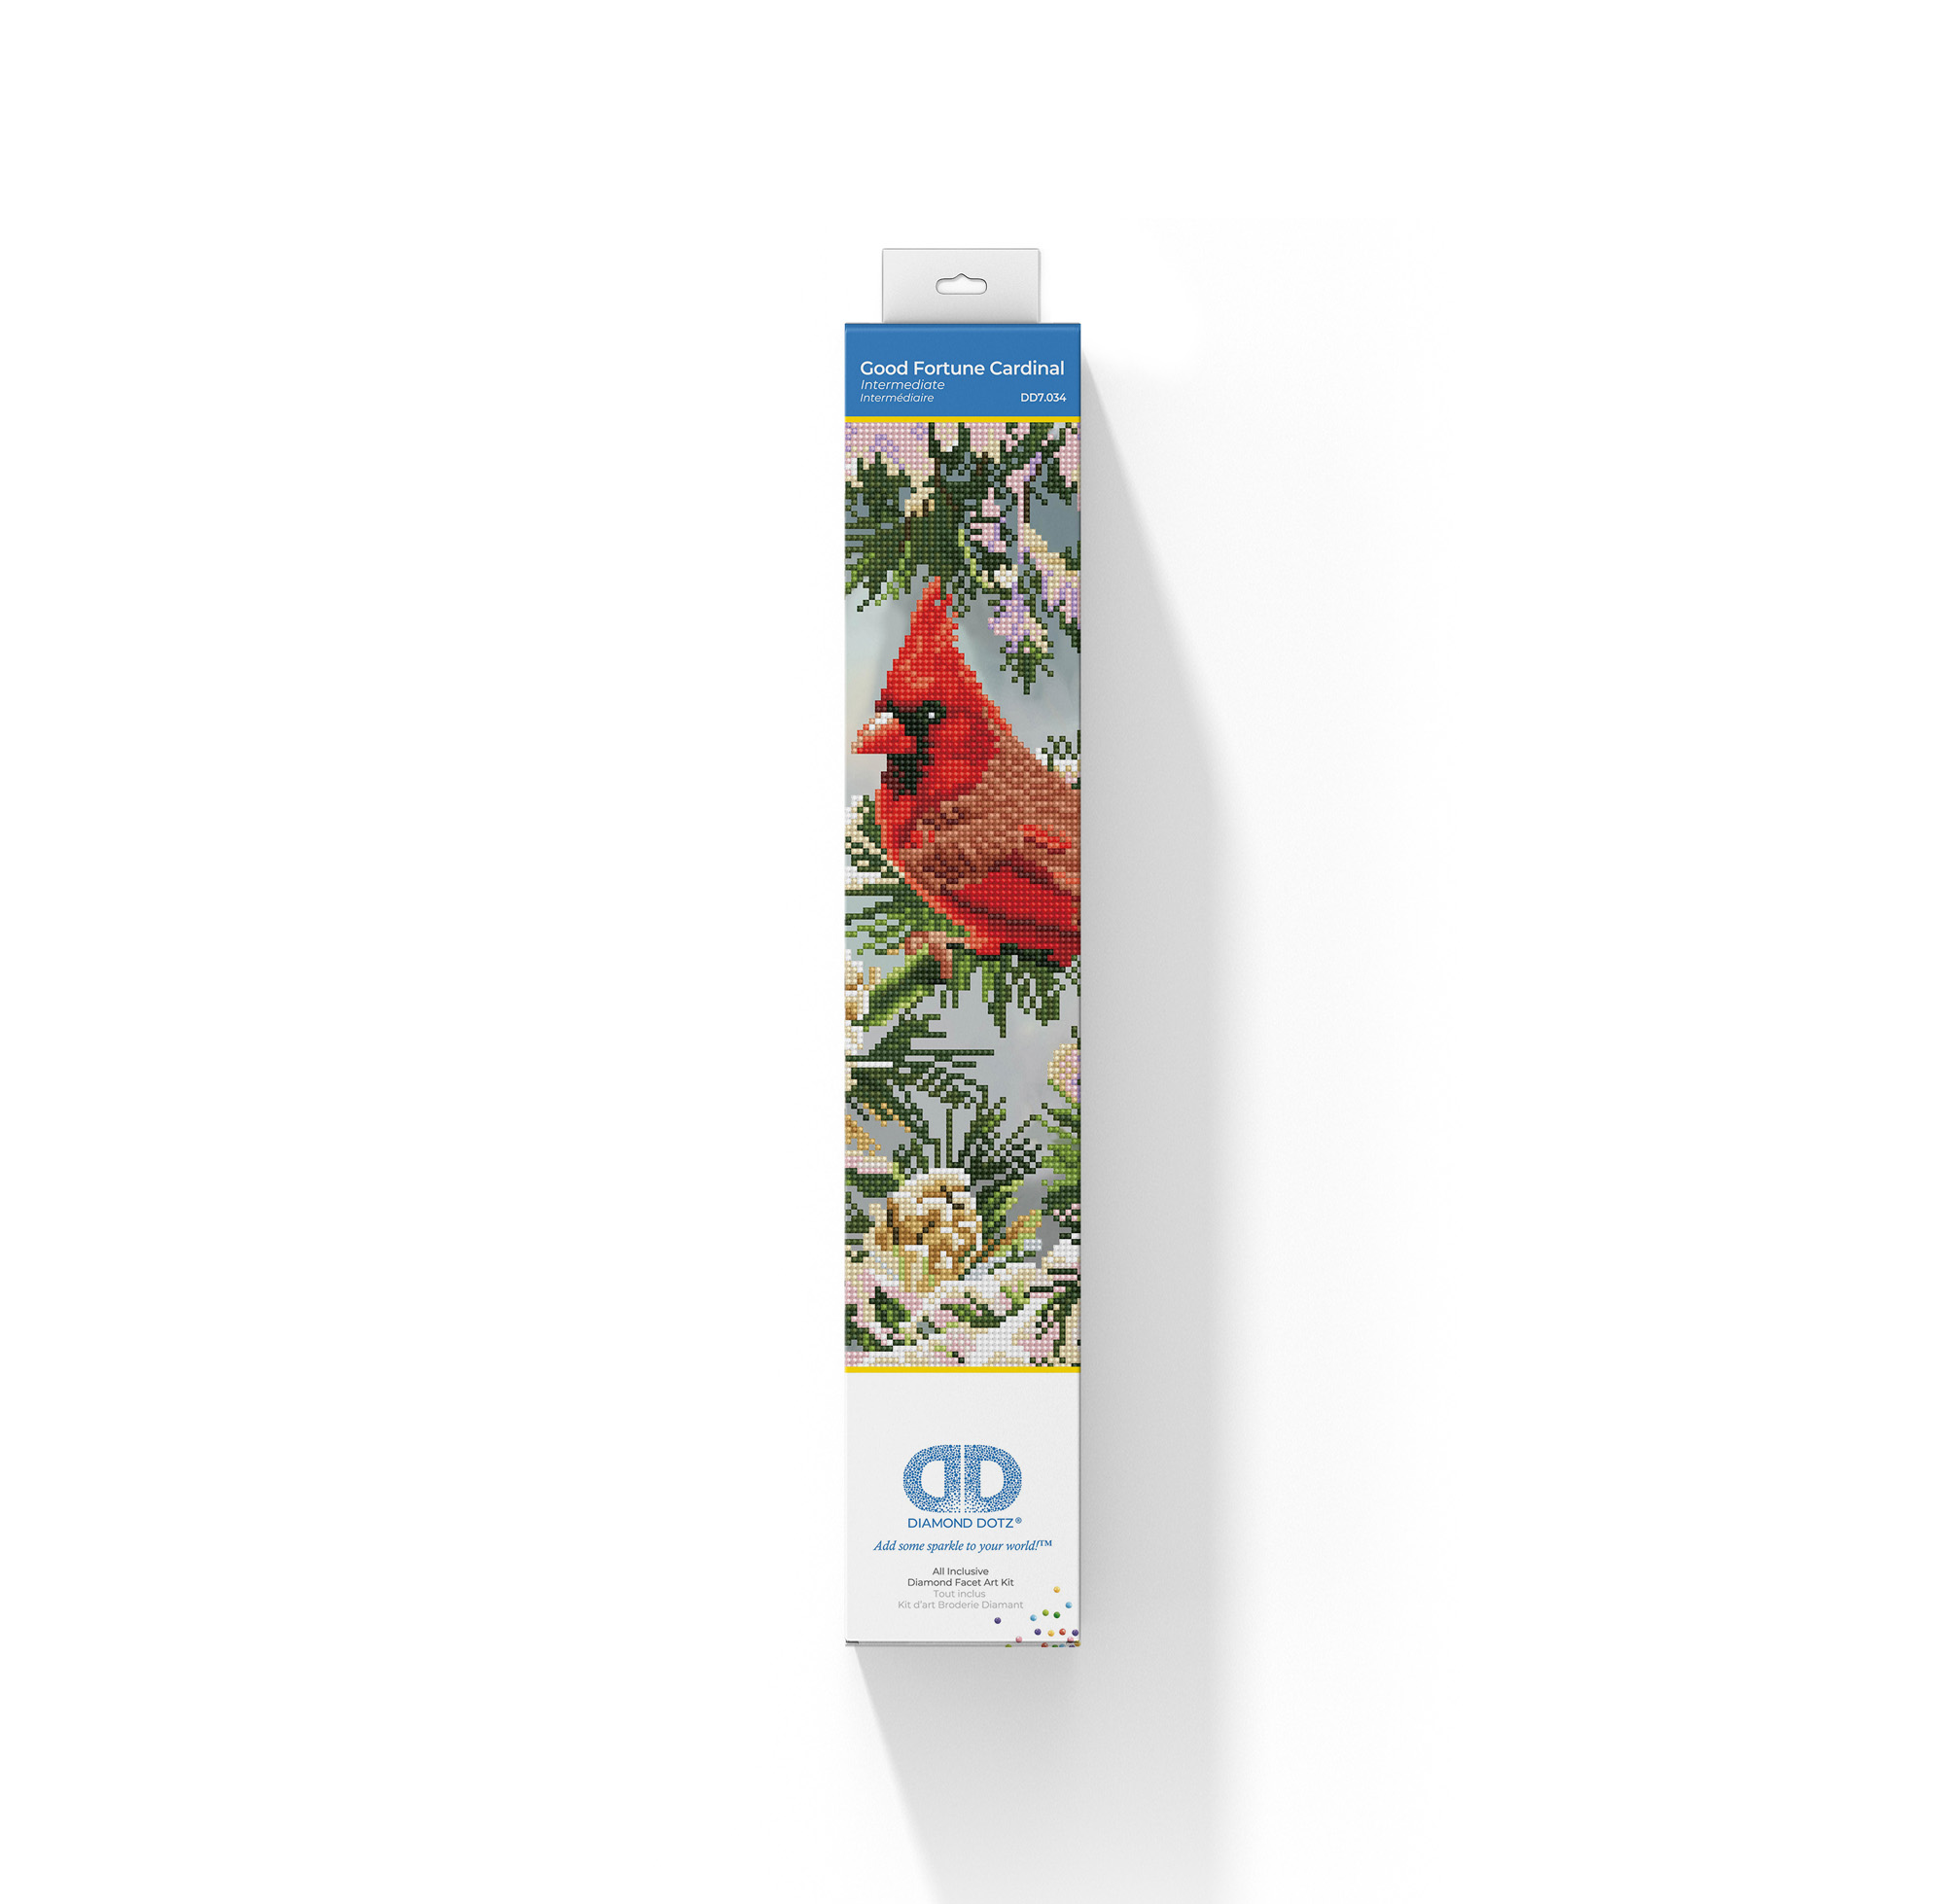 DD7.034_packaging